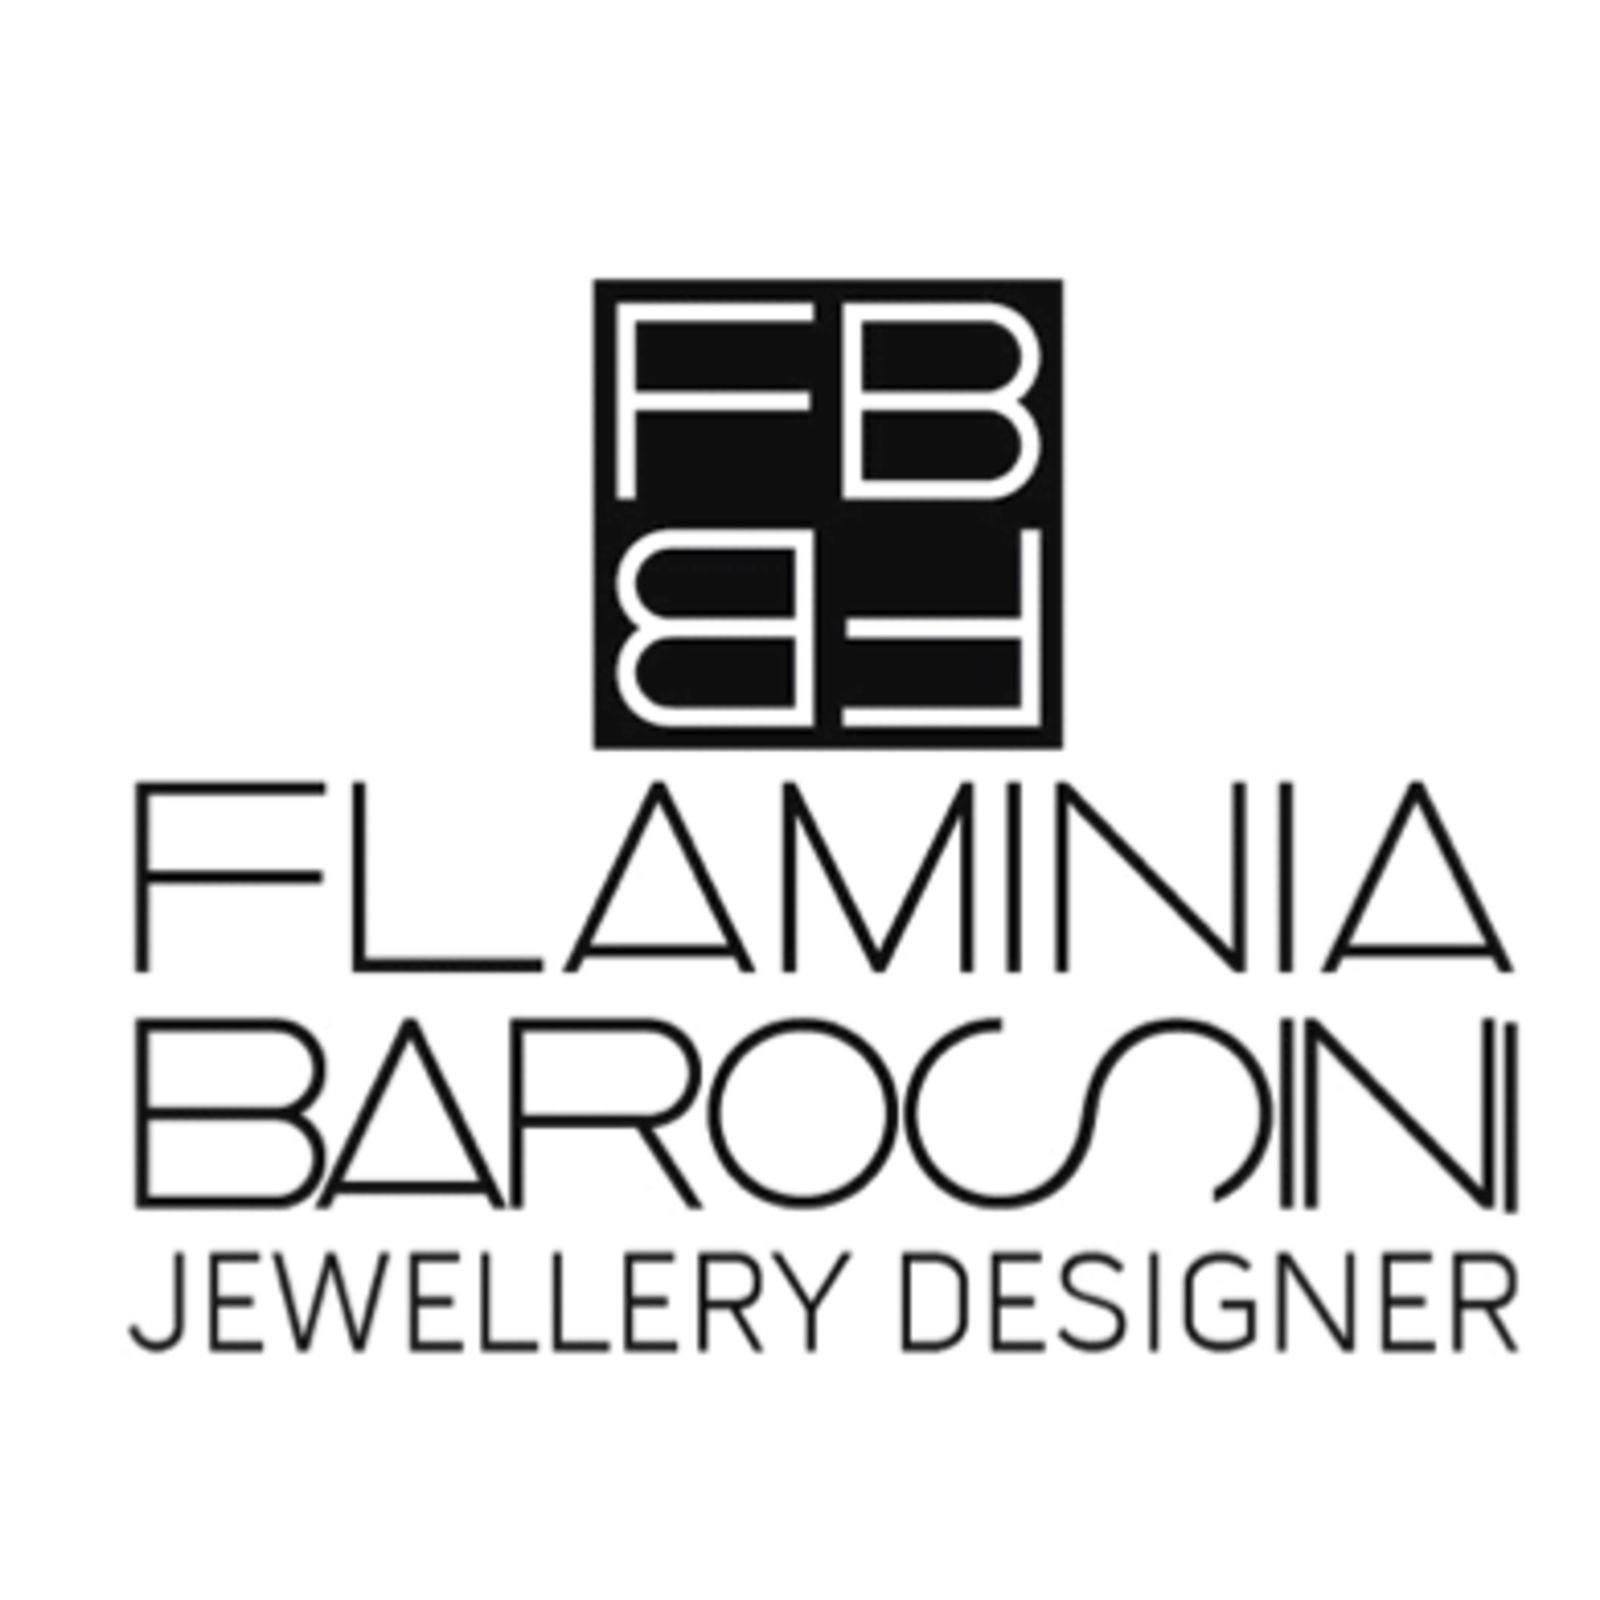 FLAMINIA BAROSINI